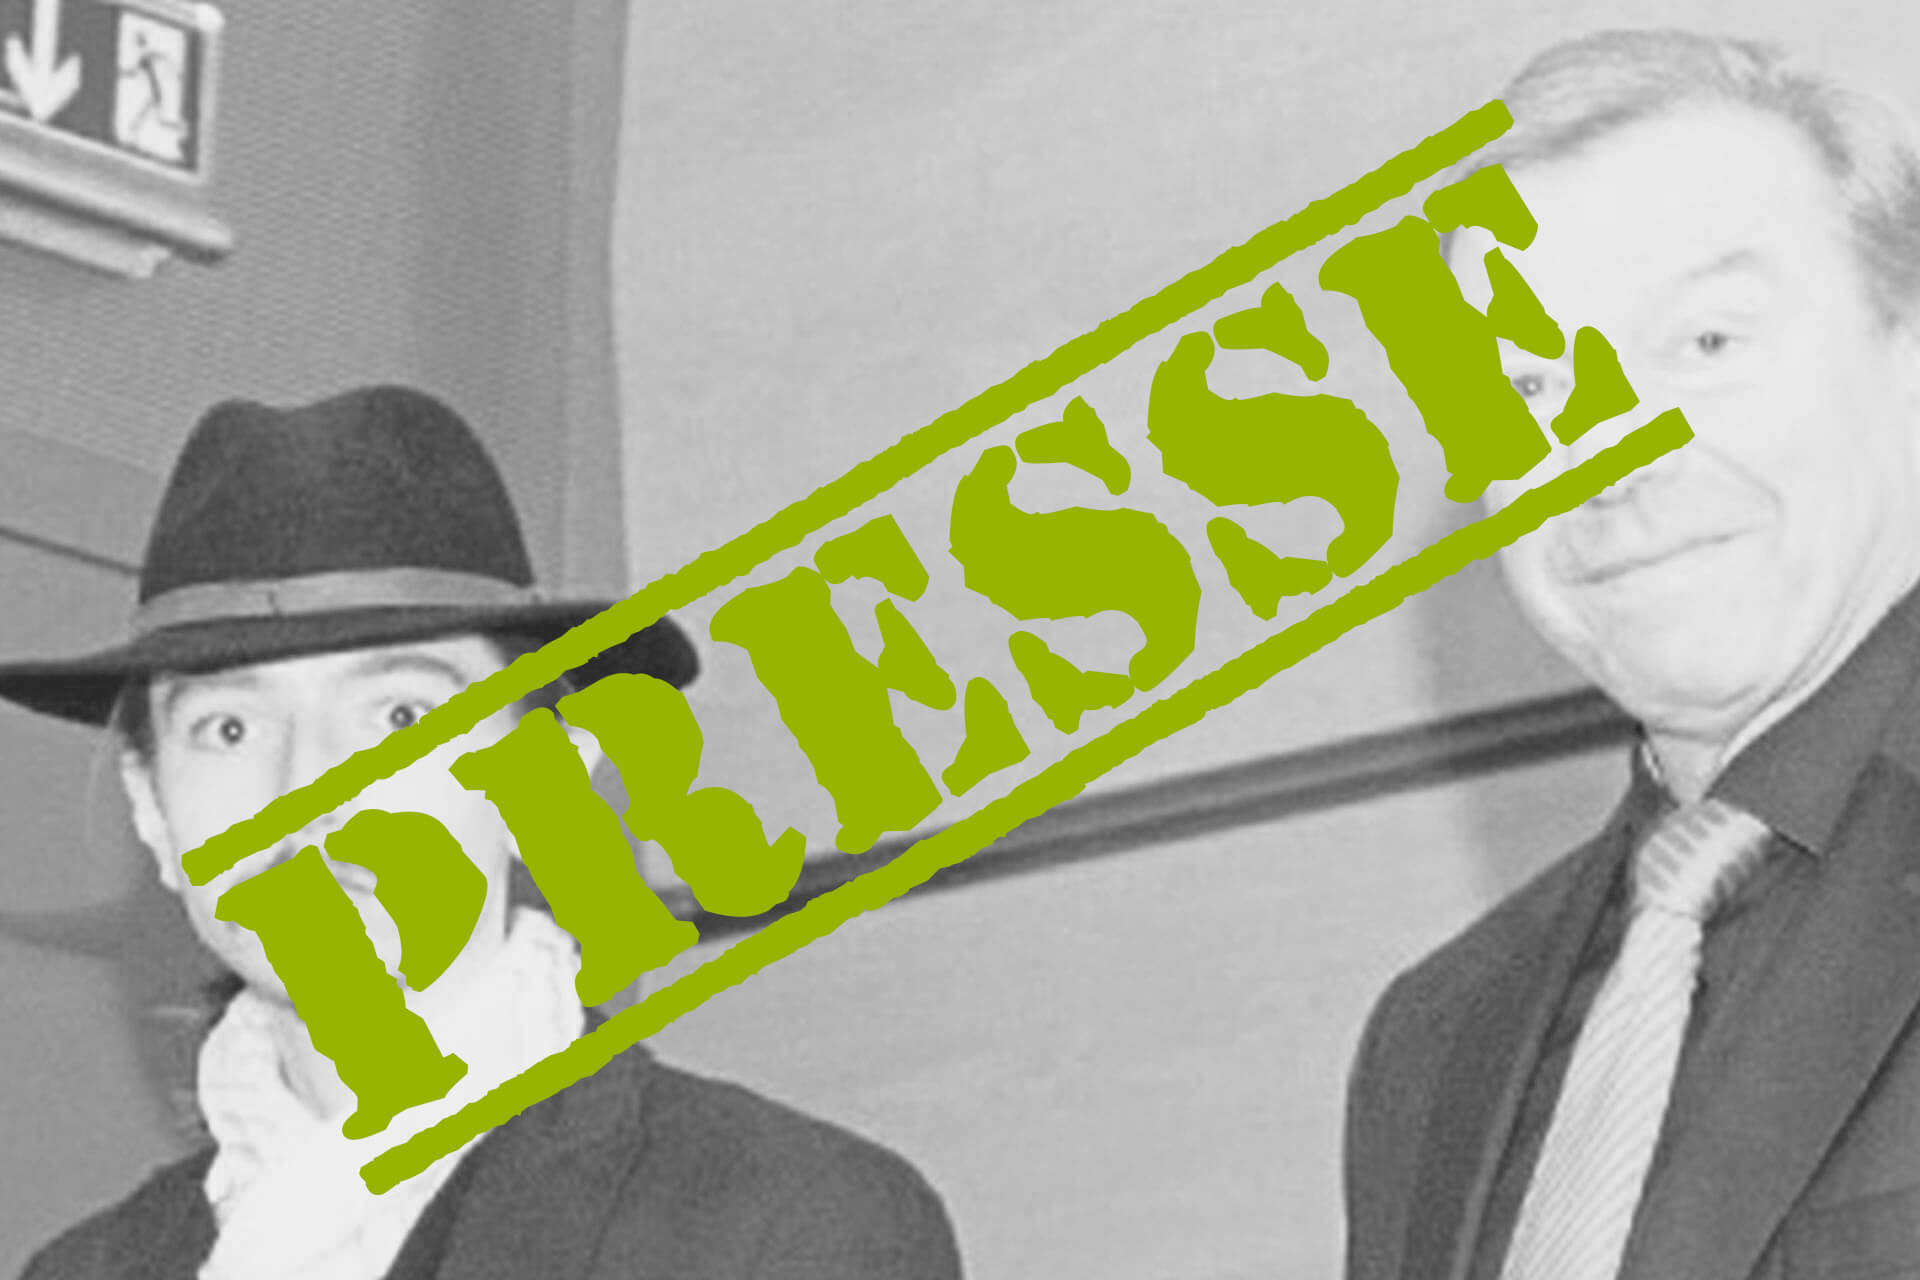 2016 02 05 Presse Troebs Preisverleihung Clip Content 1